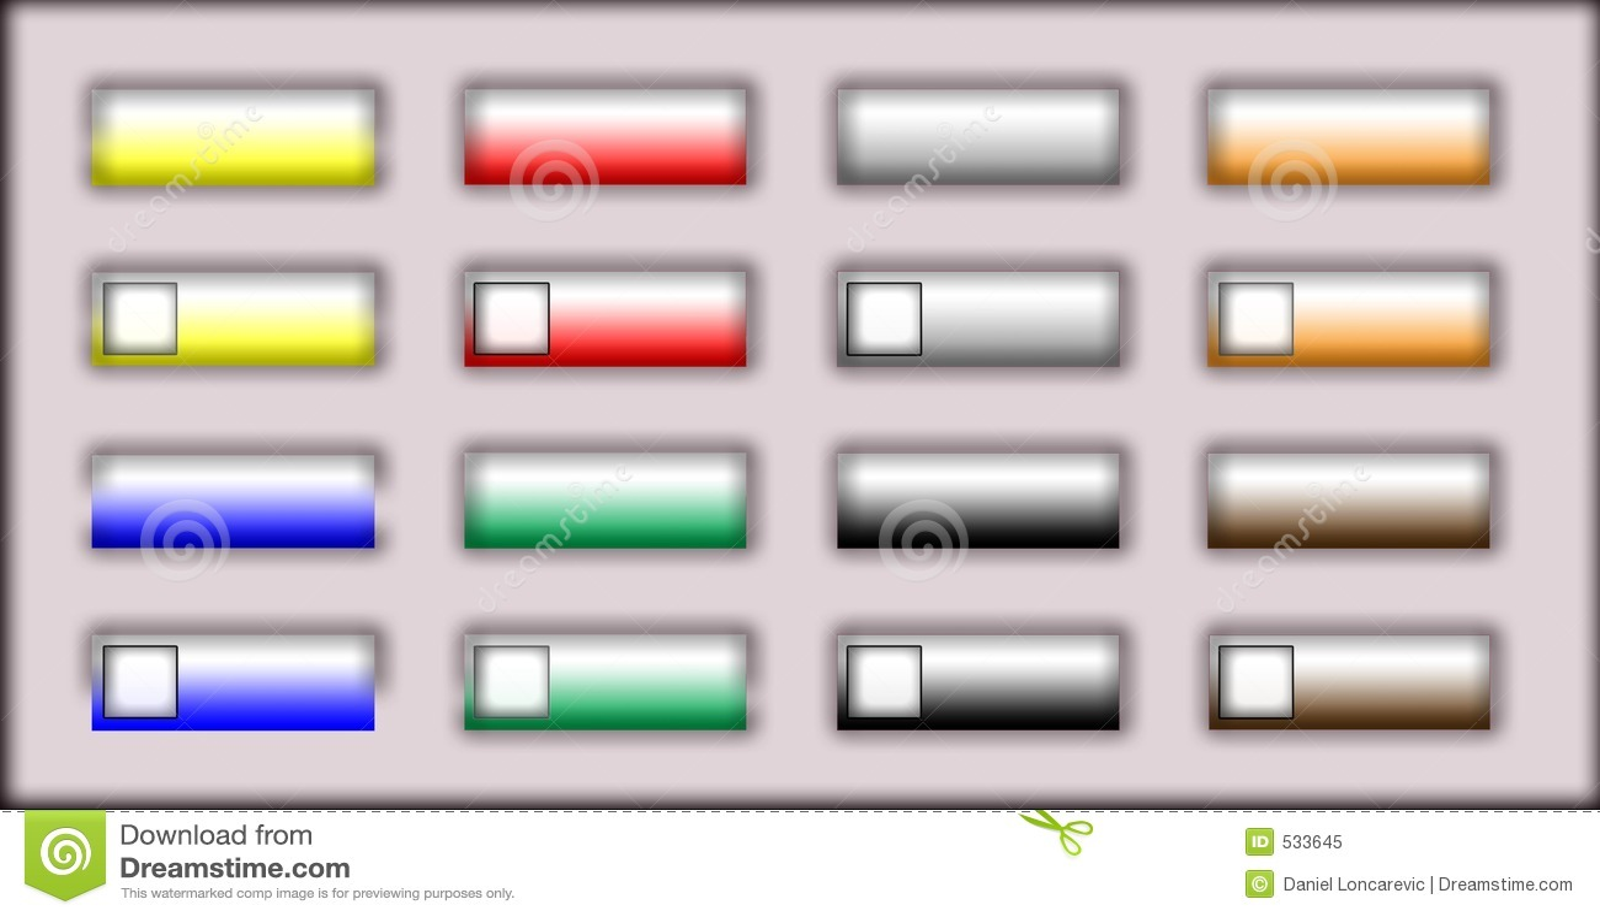 Download 按万维网 库存例证. 插画 包括有 设计, 互联网, 绿色, 按钮, 万维网, 黄色, 网站, 灰色, 例证 - 533645